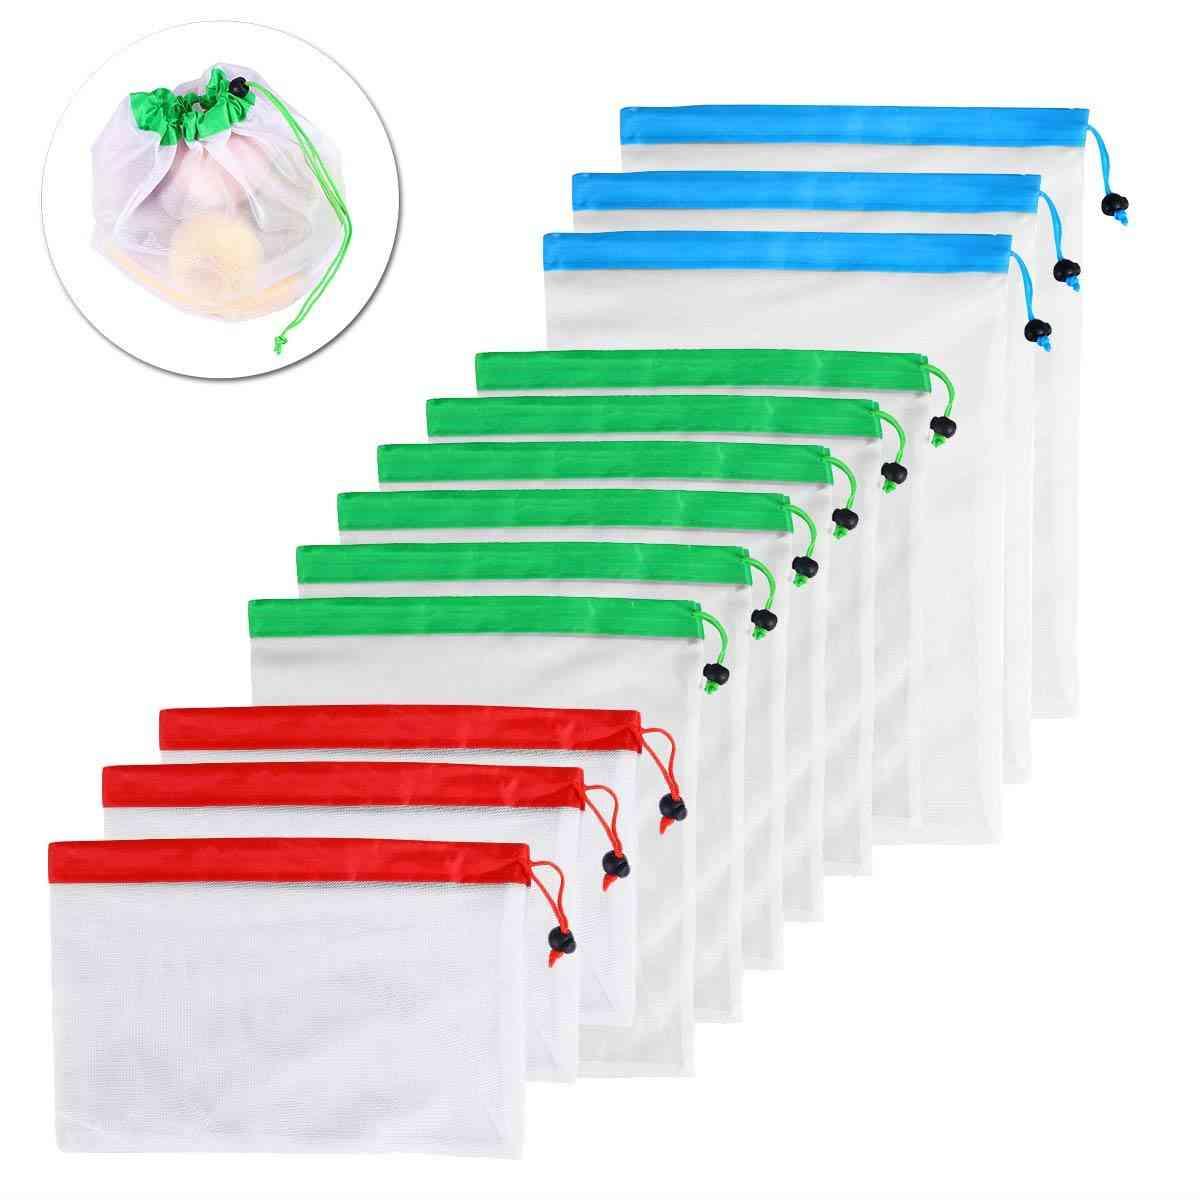 Reusable Mesh Produce Bags, Washable Eco Friendly Bag